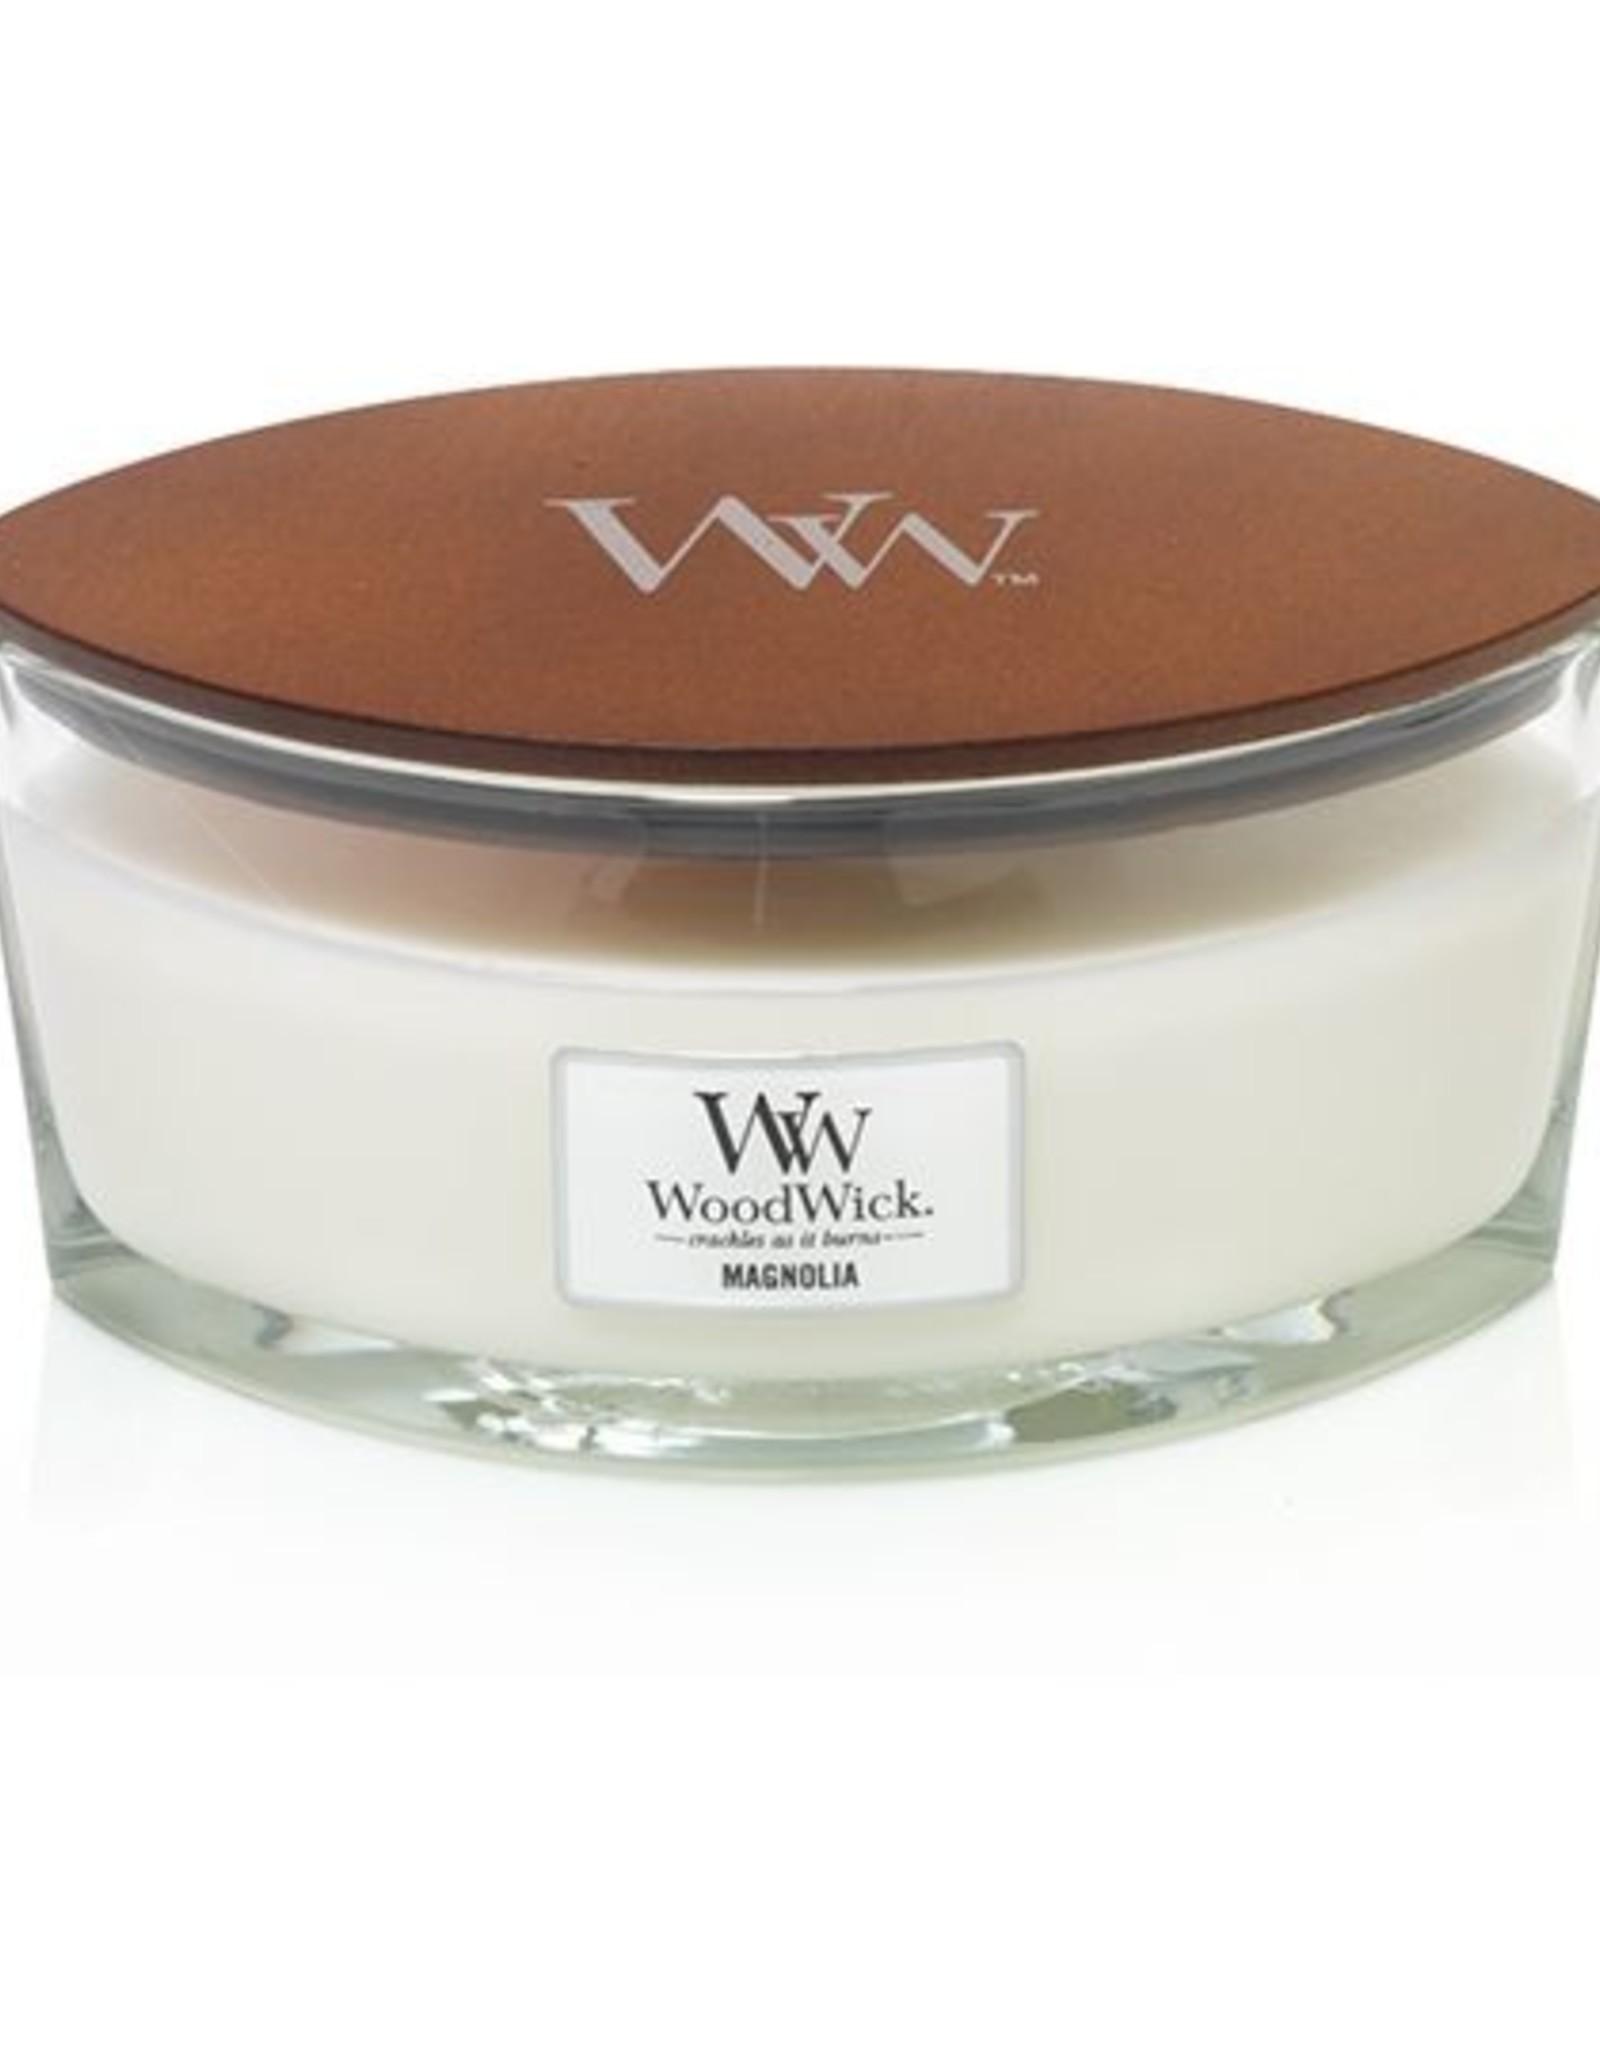 Woodwick Woodwick Magnolia Ellipse Candle